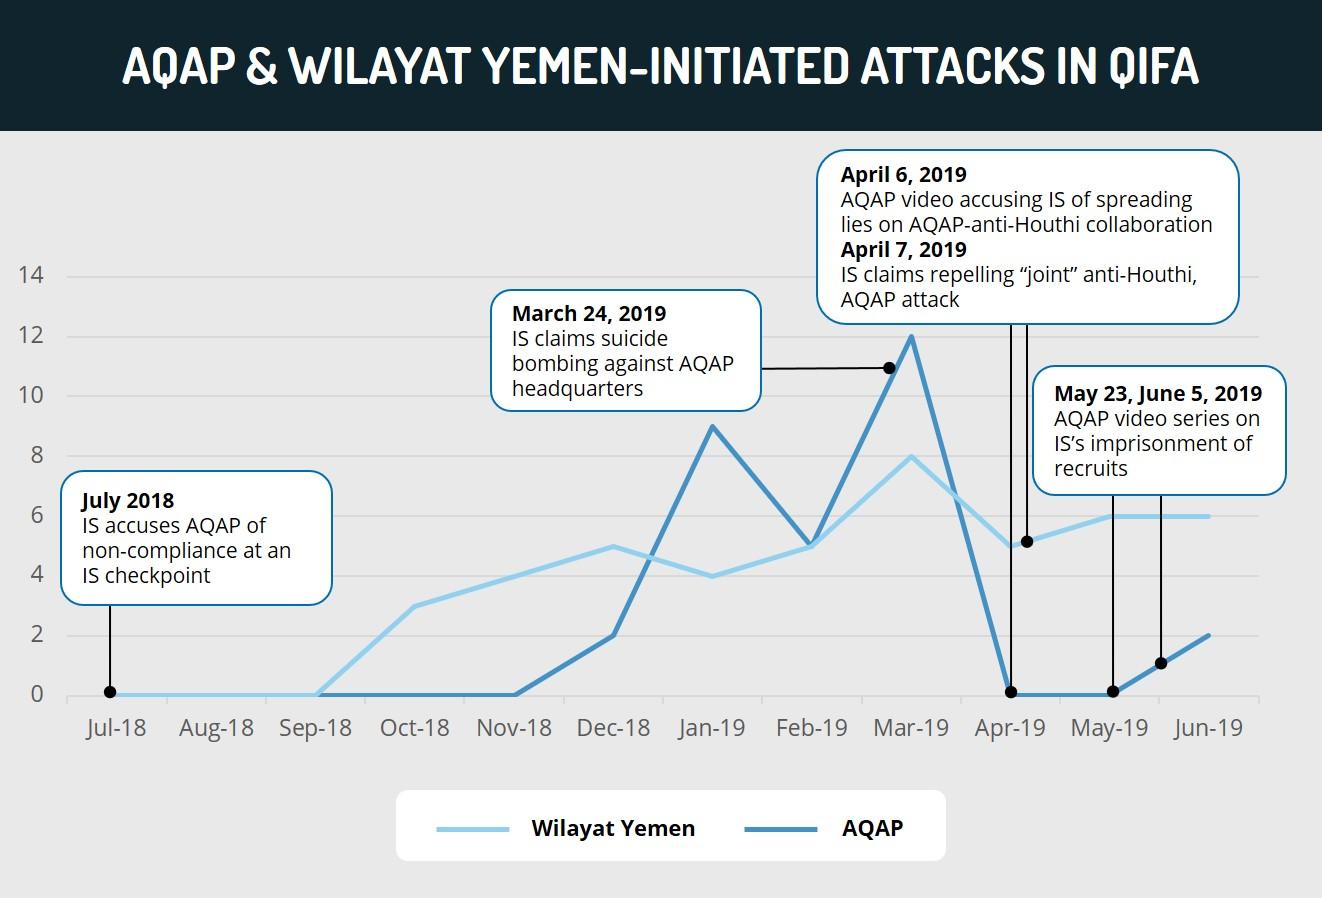 AQAP & Wilayat Yemen-Initiated Attacks in Qifa